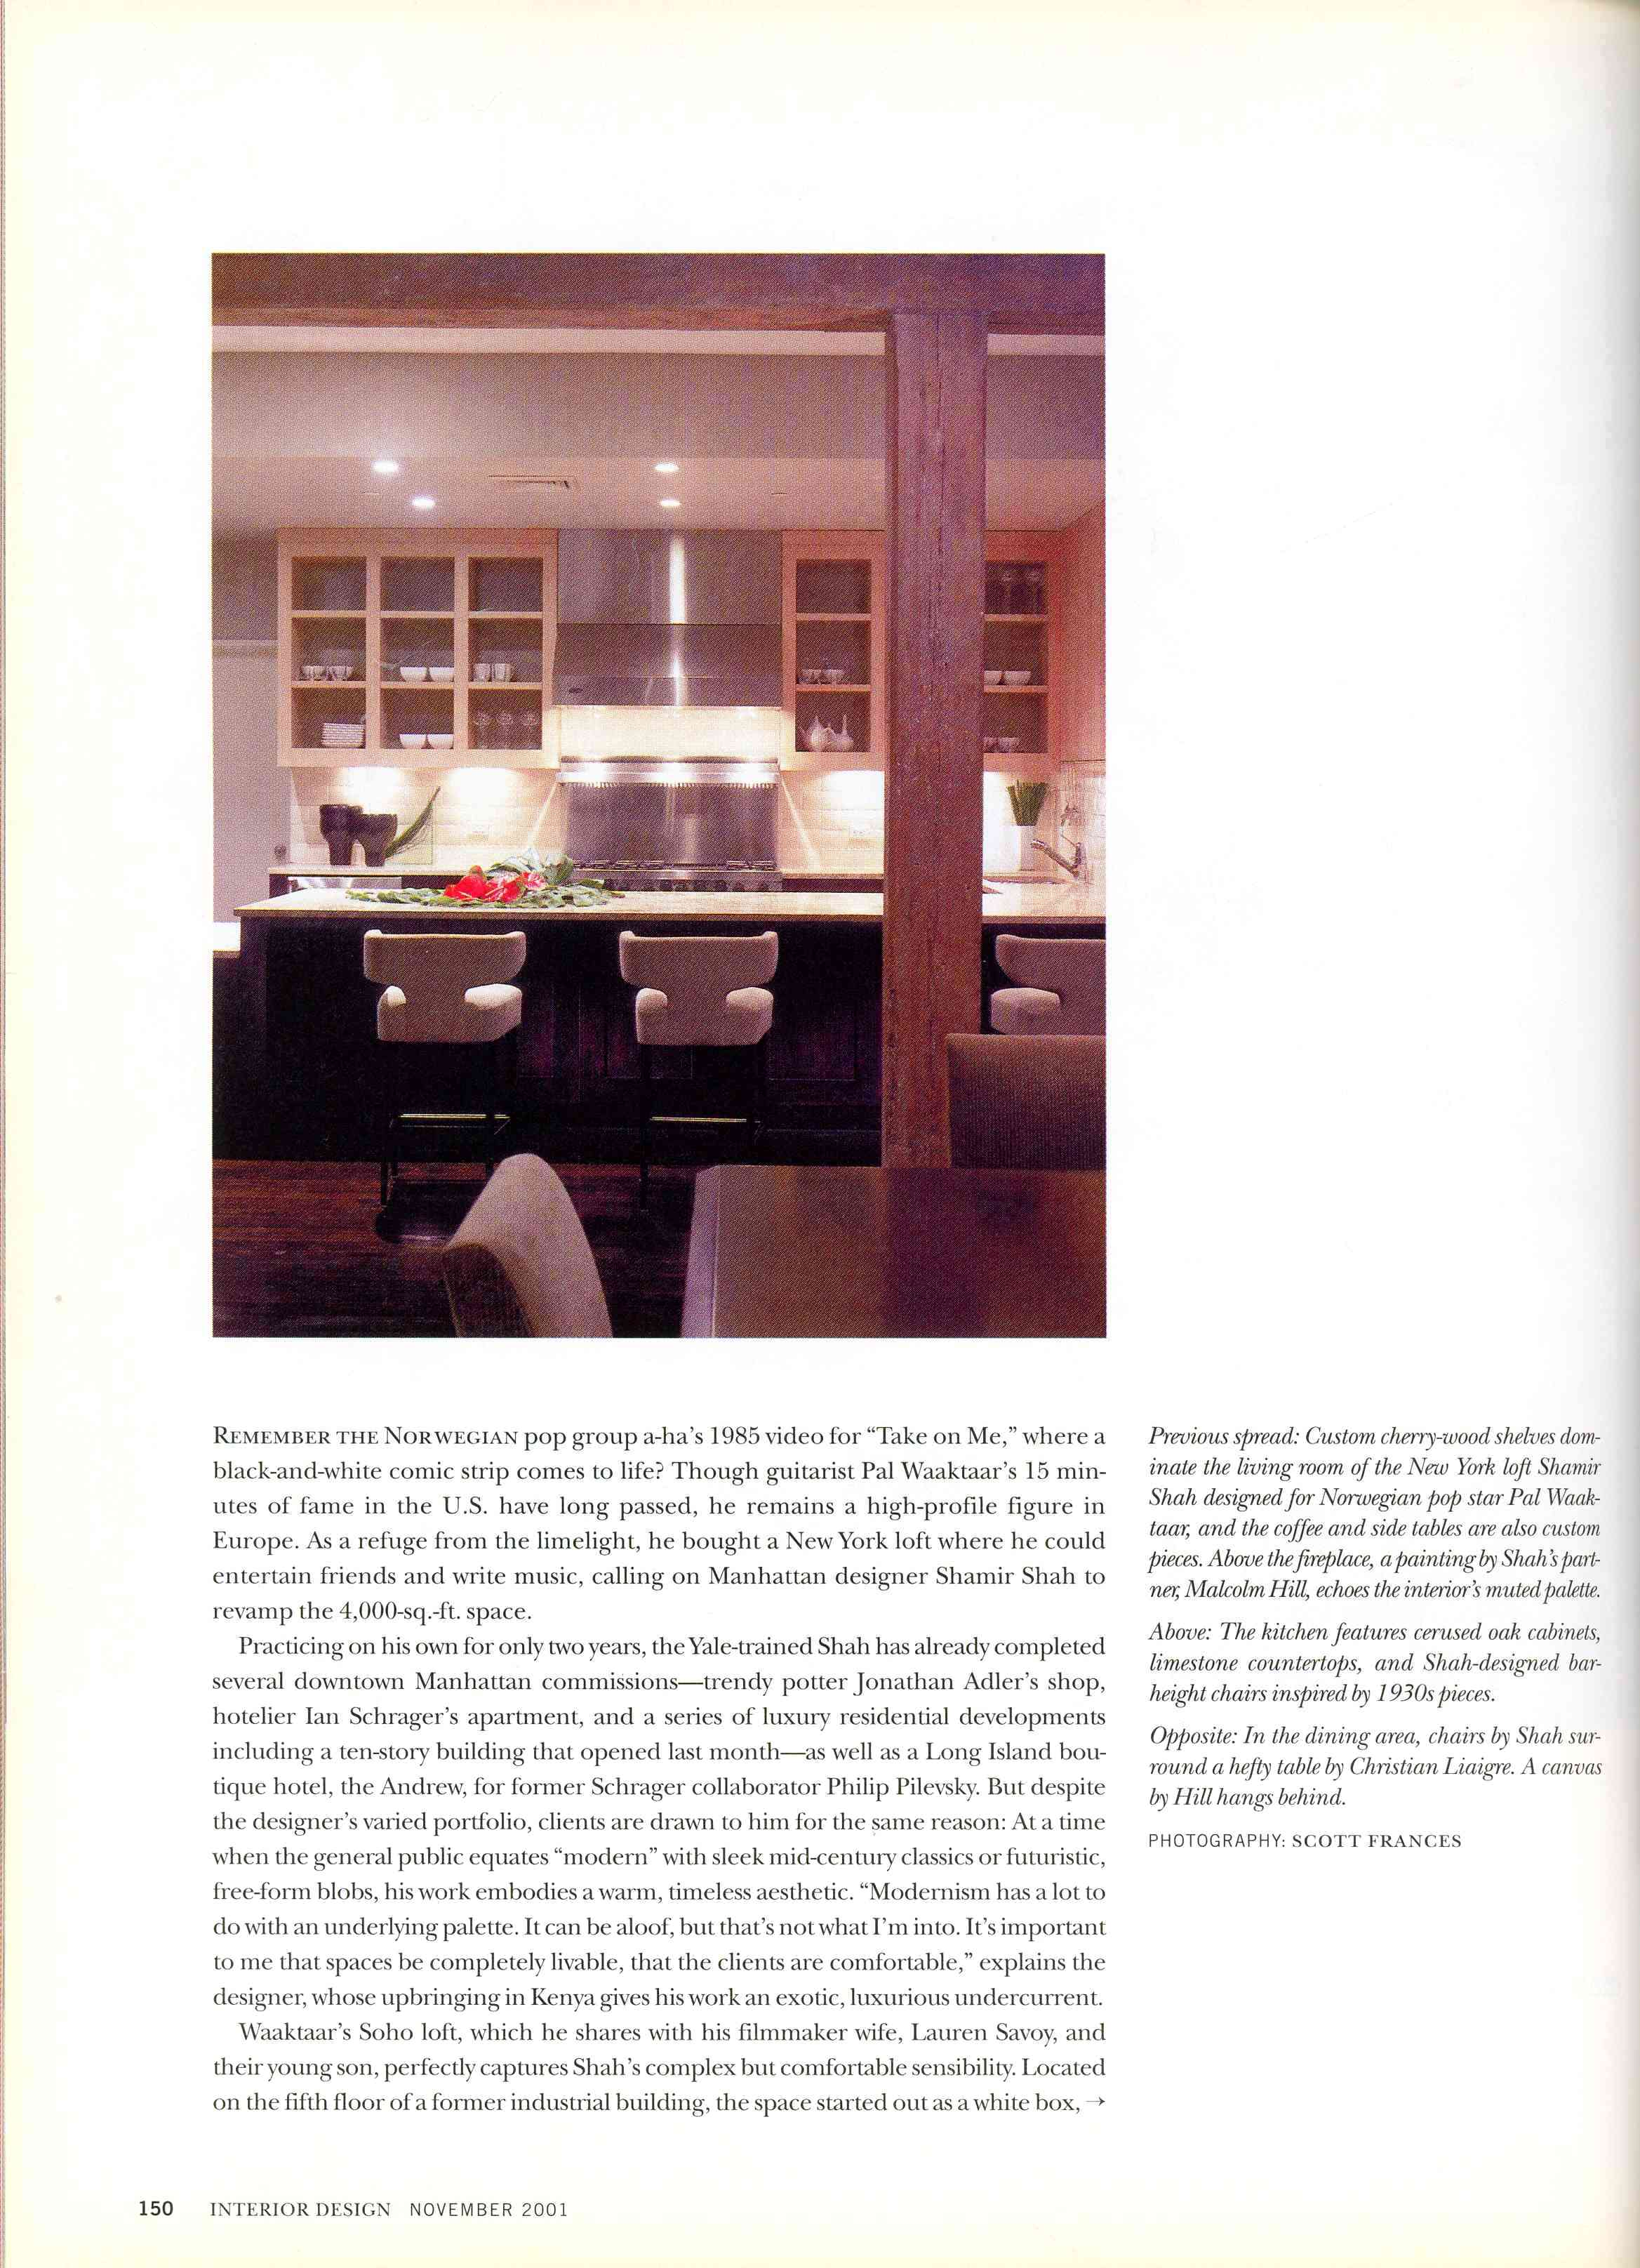 Interior Design_Nov 01_Savoy_Full Article_Page_4.jpg